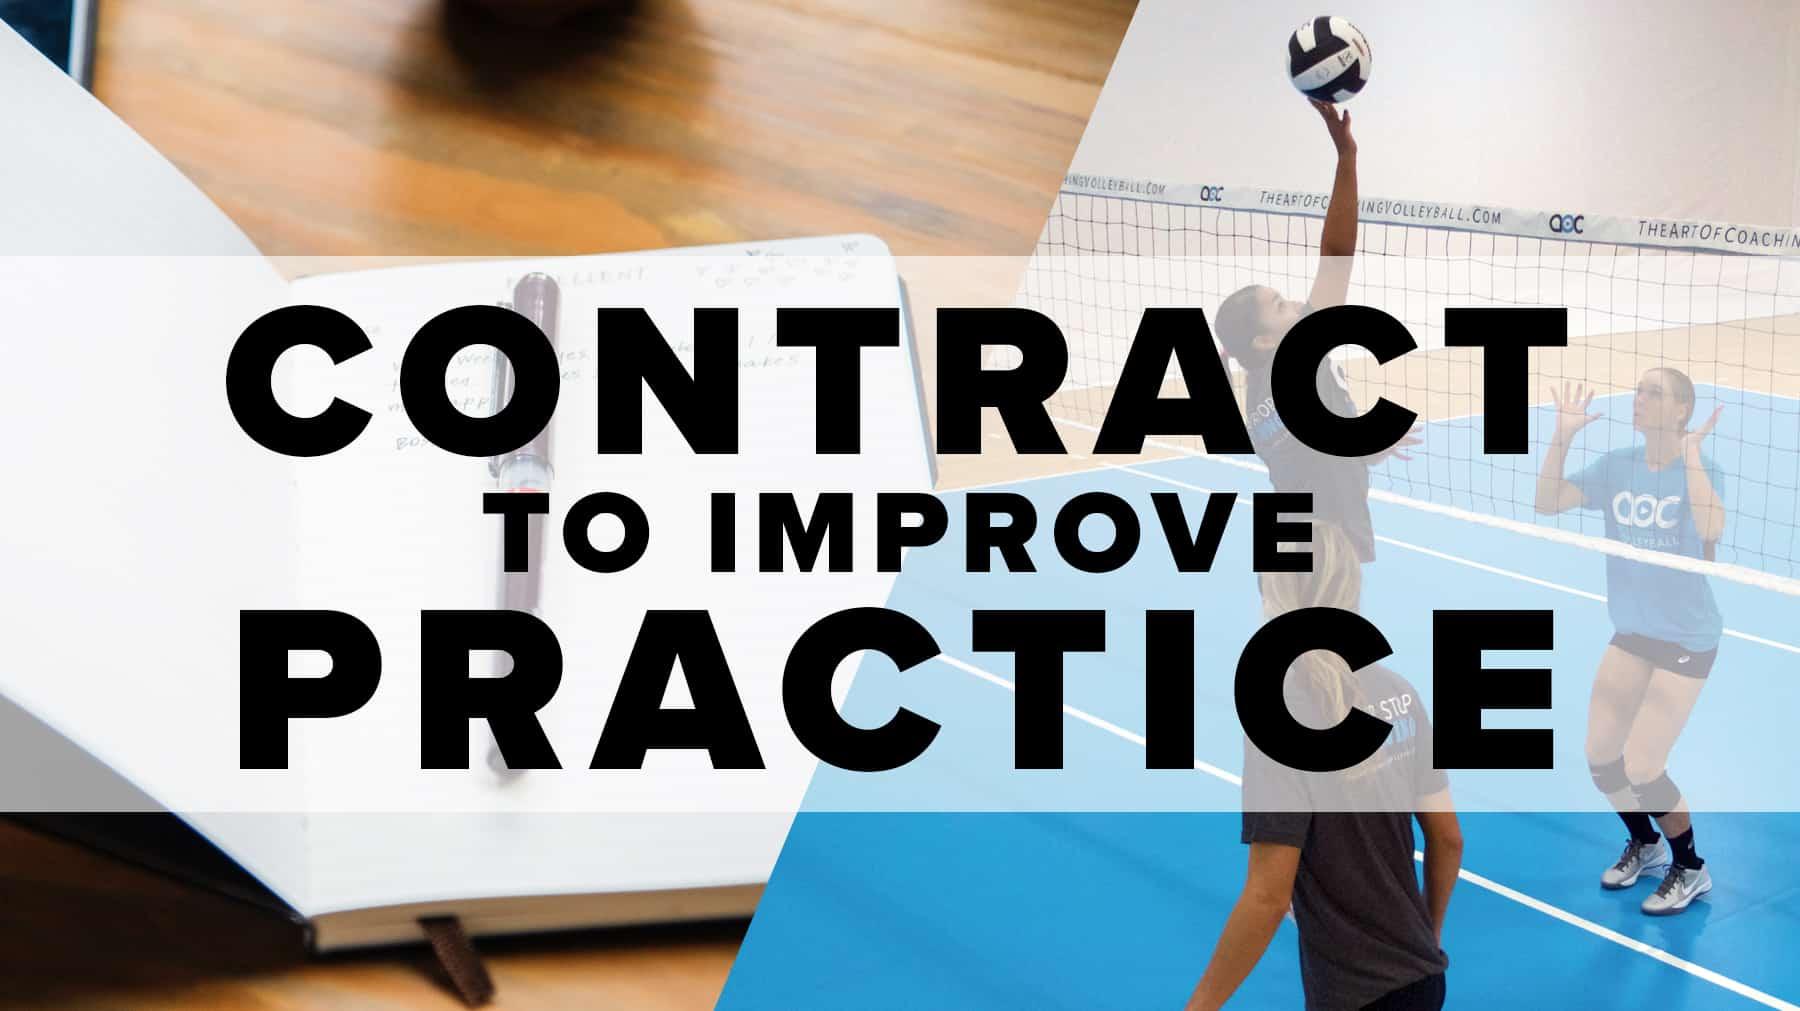 Contract to improve practice